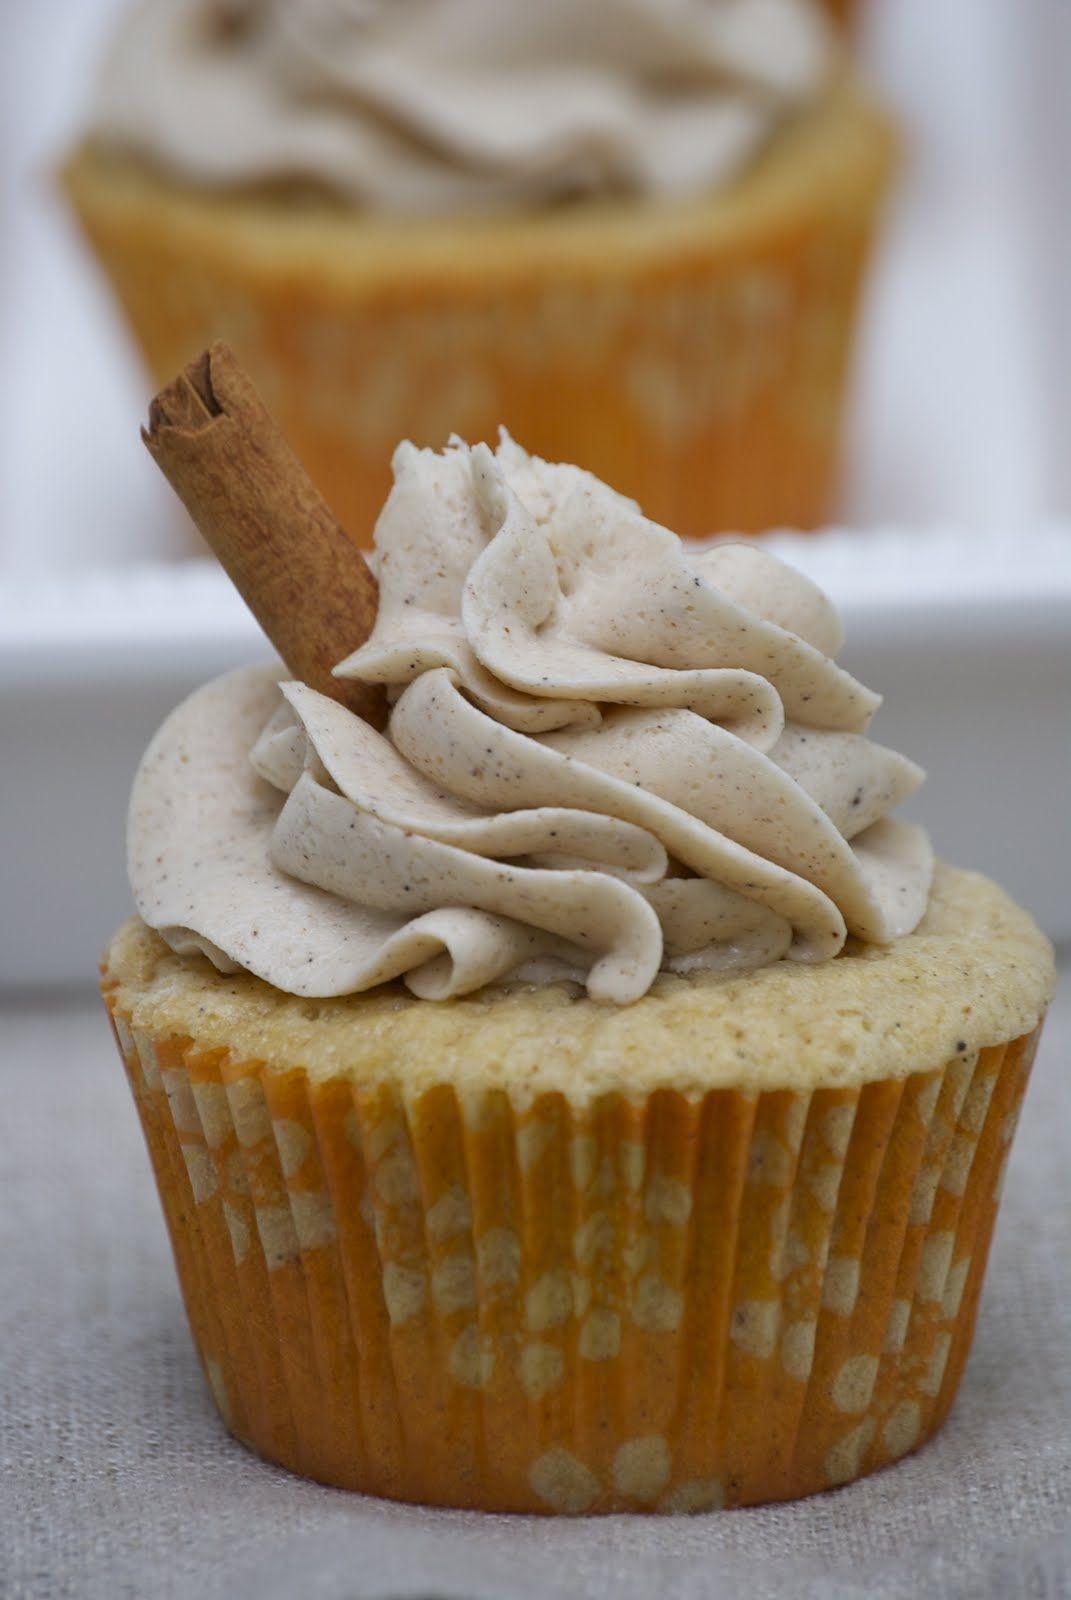 Vanilla Chai Cupcakes with Cinnamon Buttercream Frosting